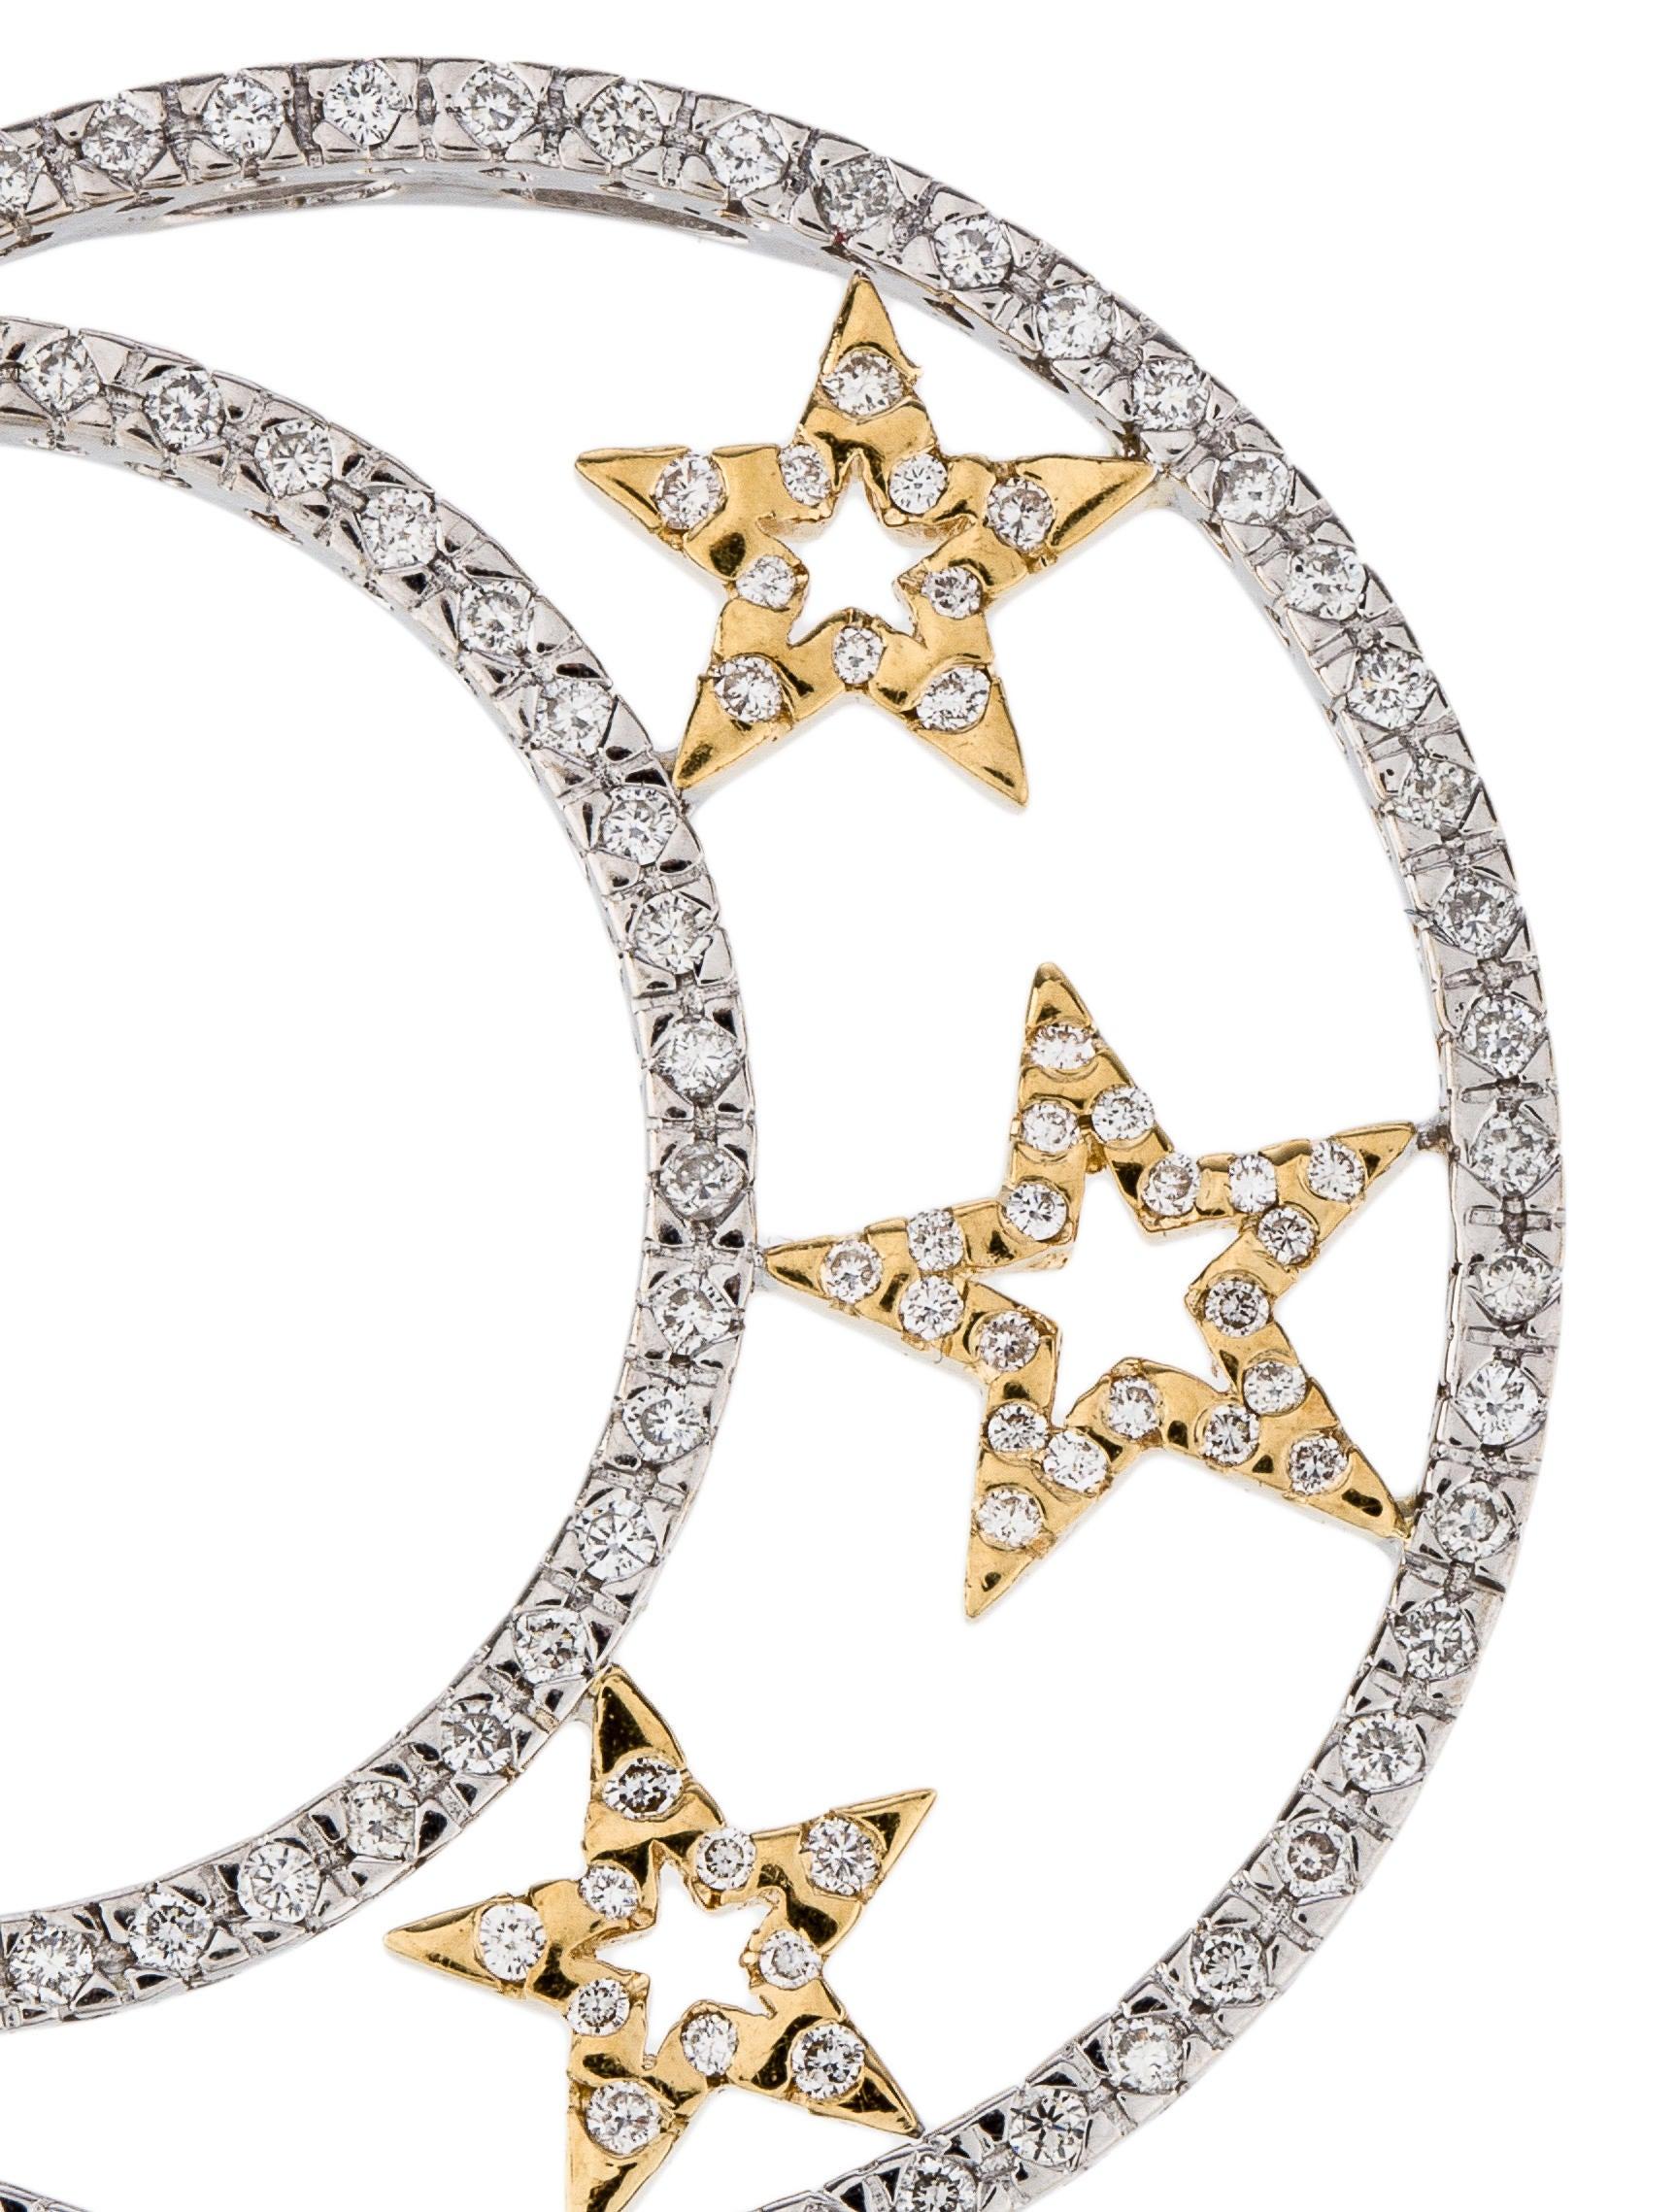 18K Diamond Moon & Star Pendant - Necklaces - PENDA22140 ...